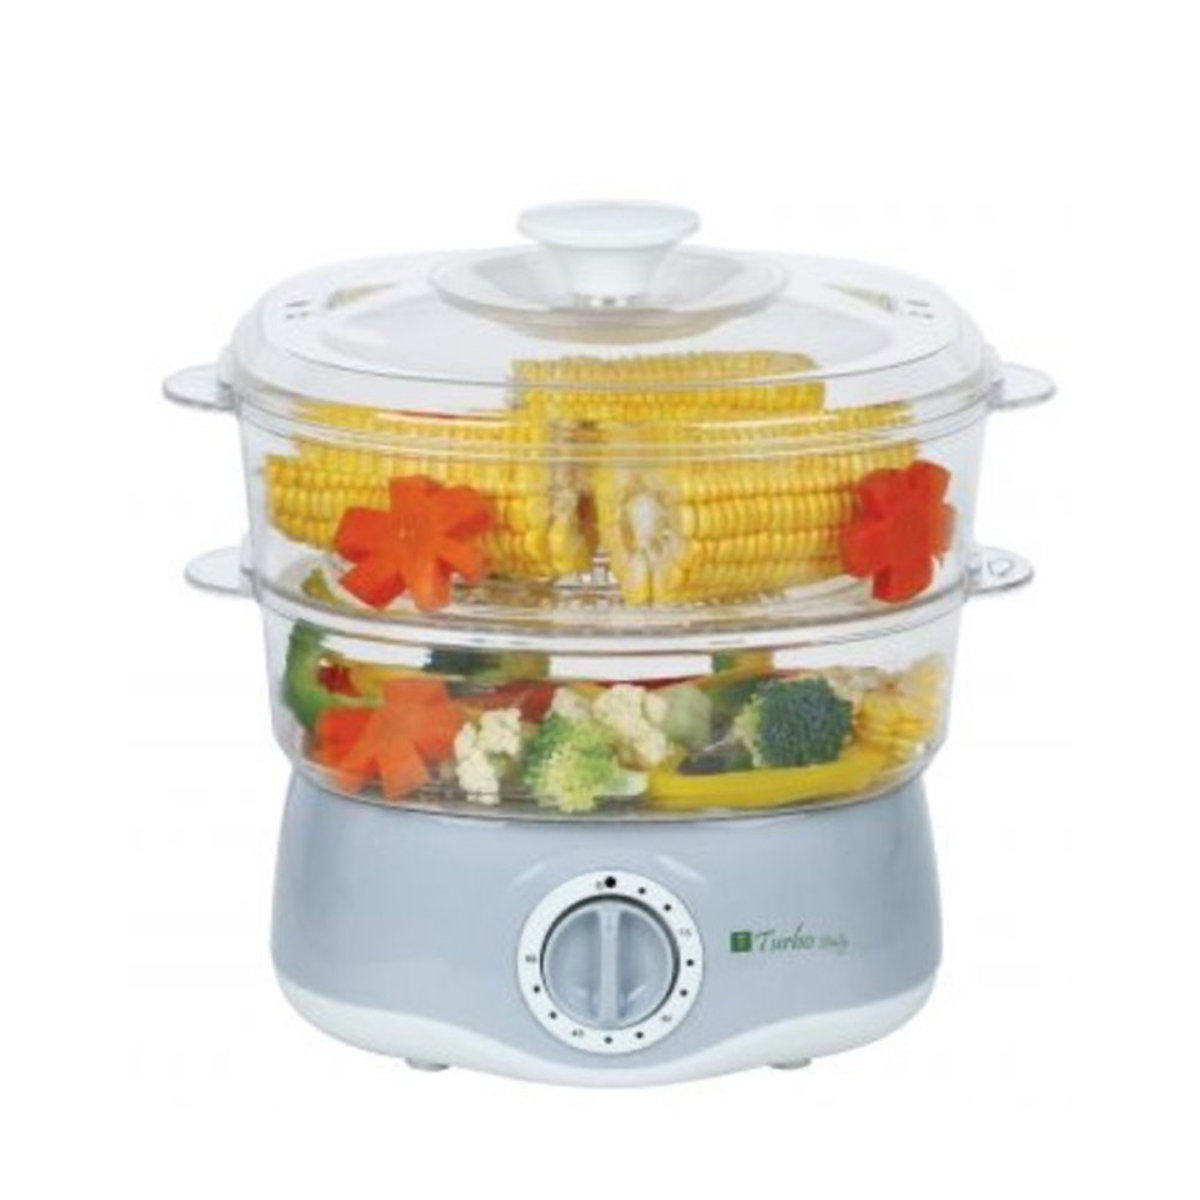 4L Food Steamer - TES-302